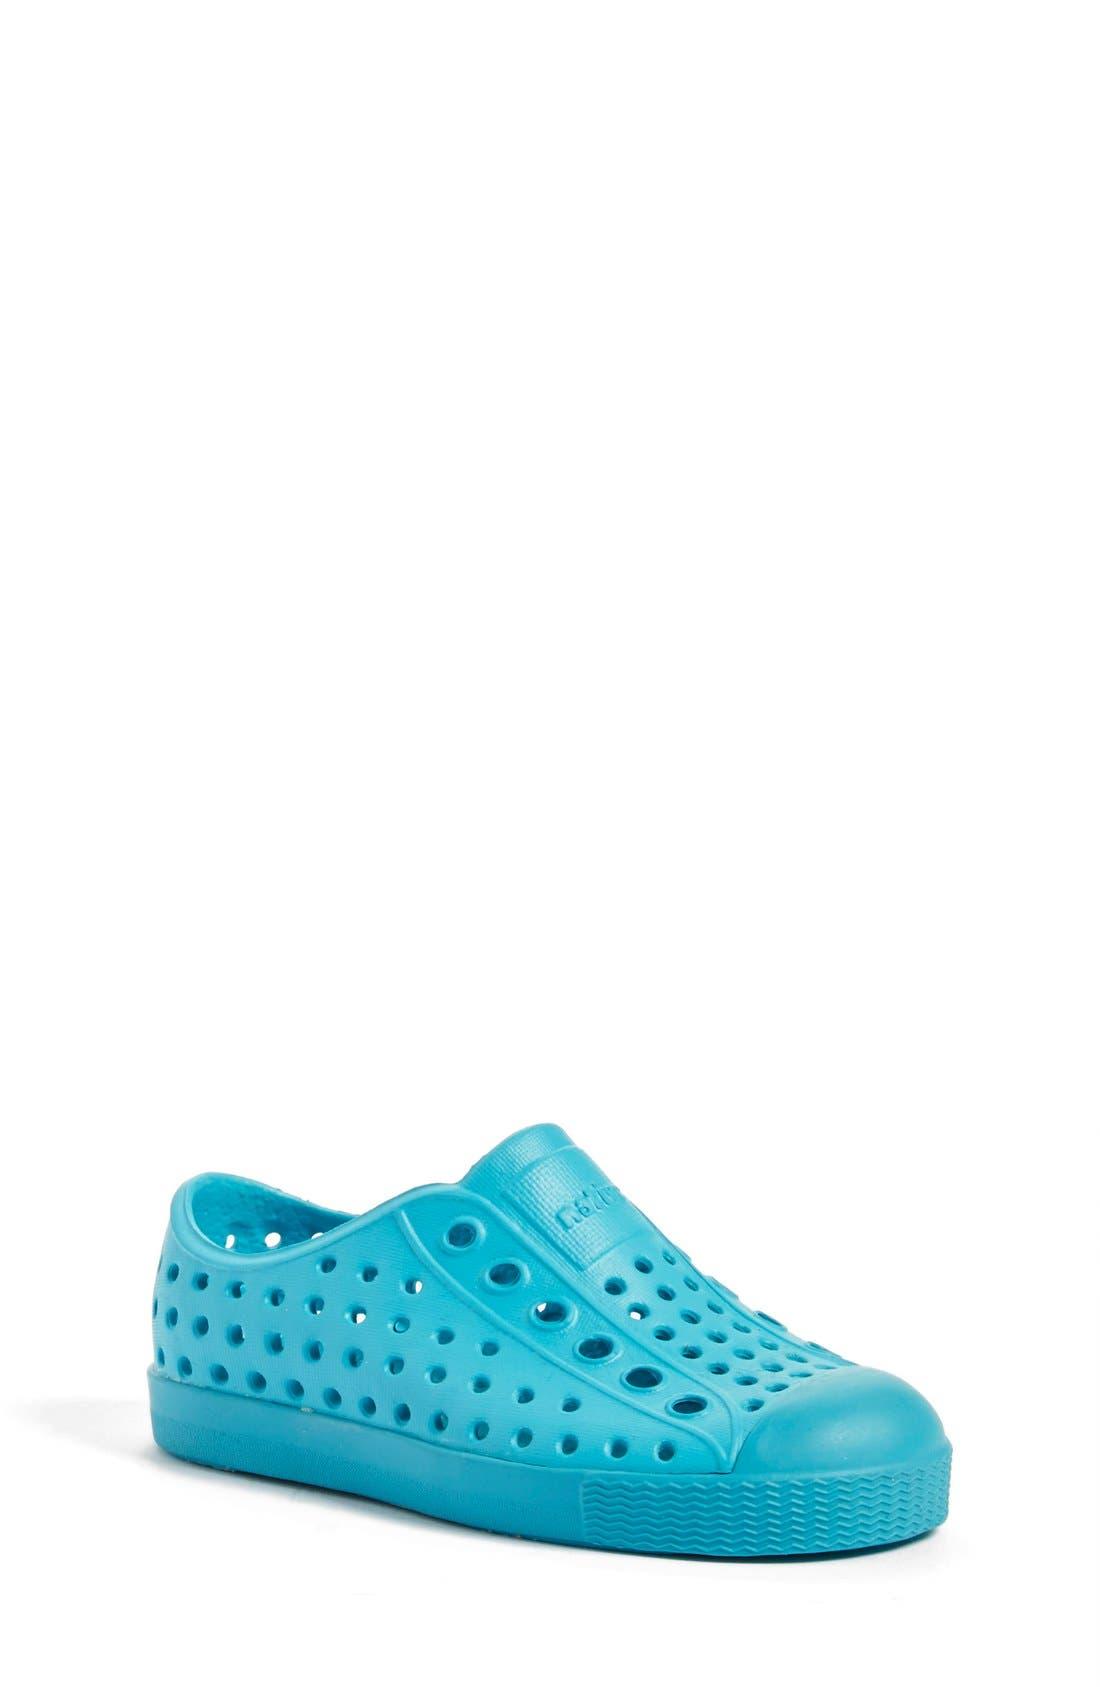 'Jefferson' Water Friendly Slip-On Sneaker,                             Main thumbnail 51, color,